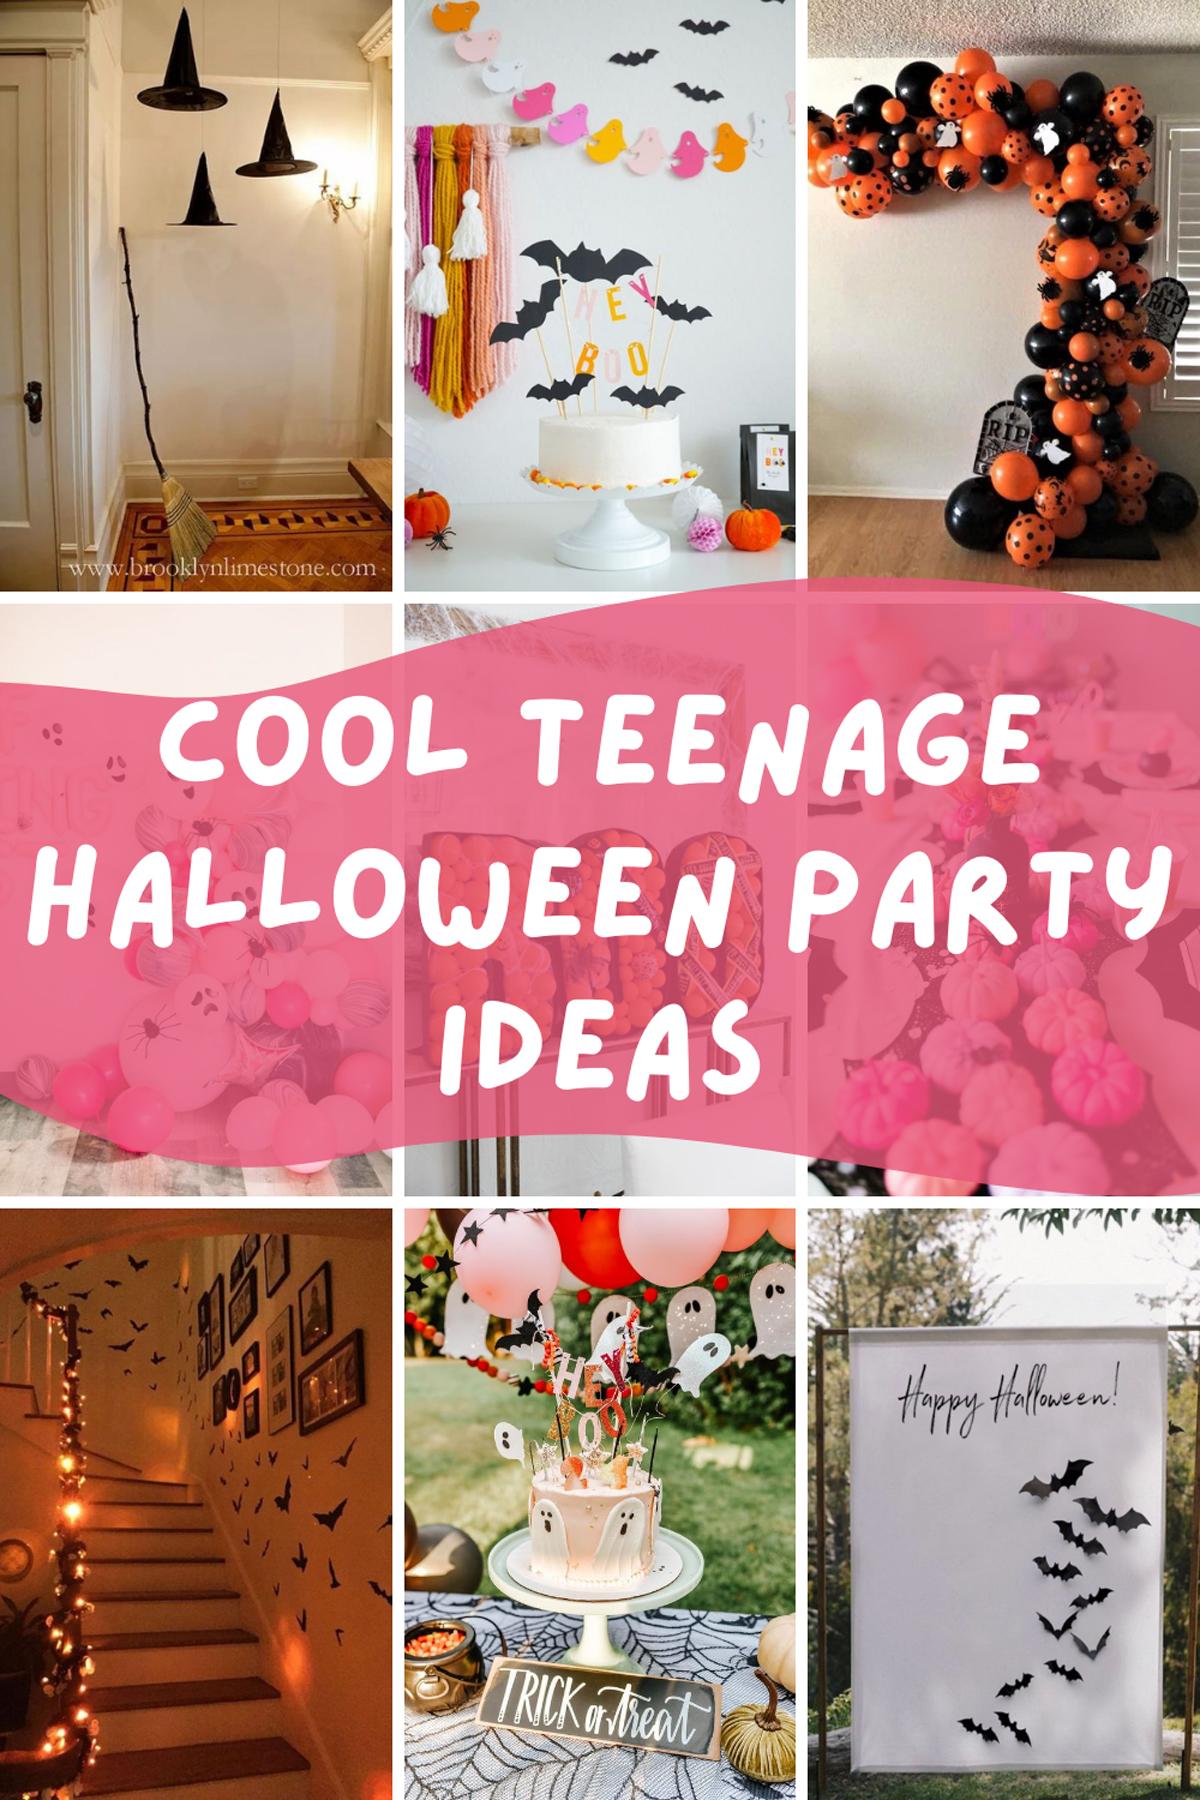 Cool Teenage Halloween Party Ideas